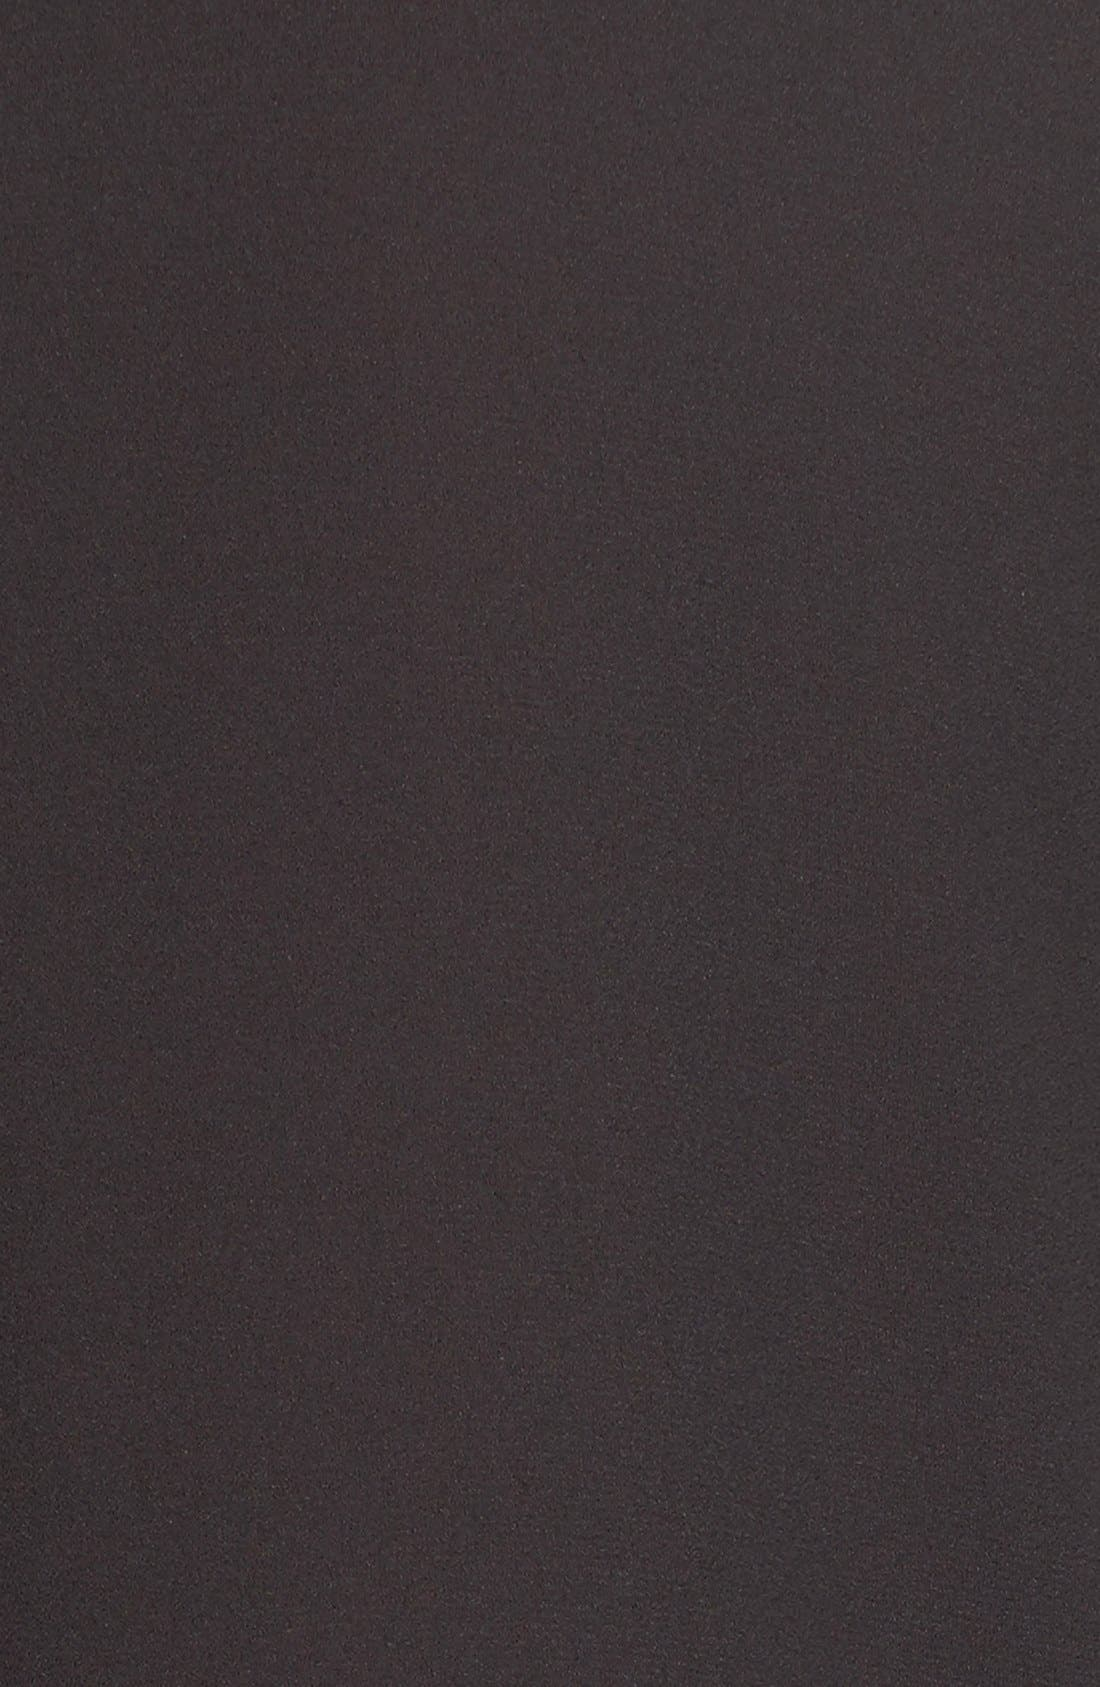 V-Neck Crepe Blouse,                             Alternate thumbnail 3, color,                             001